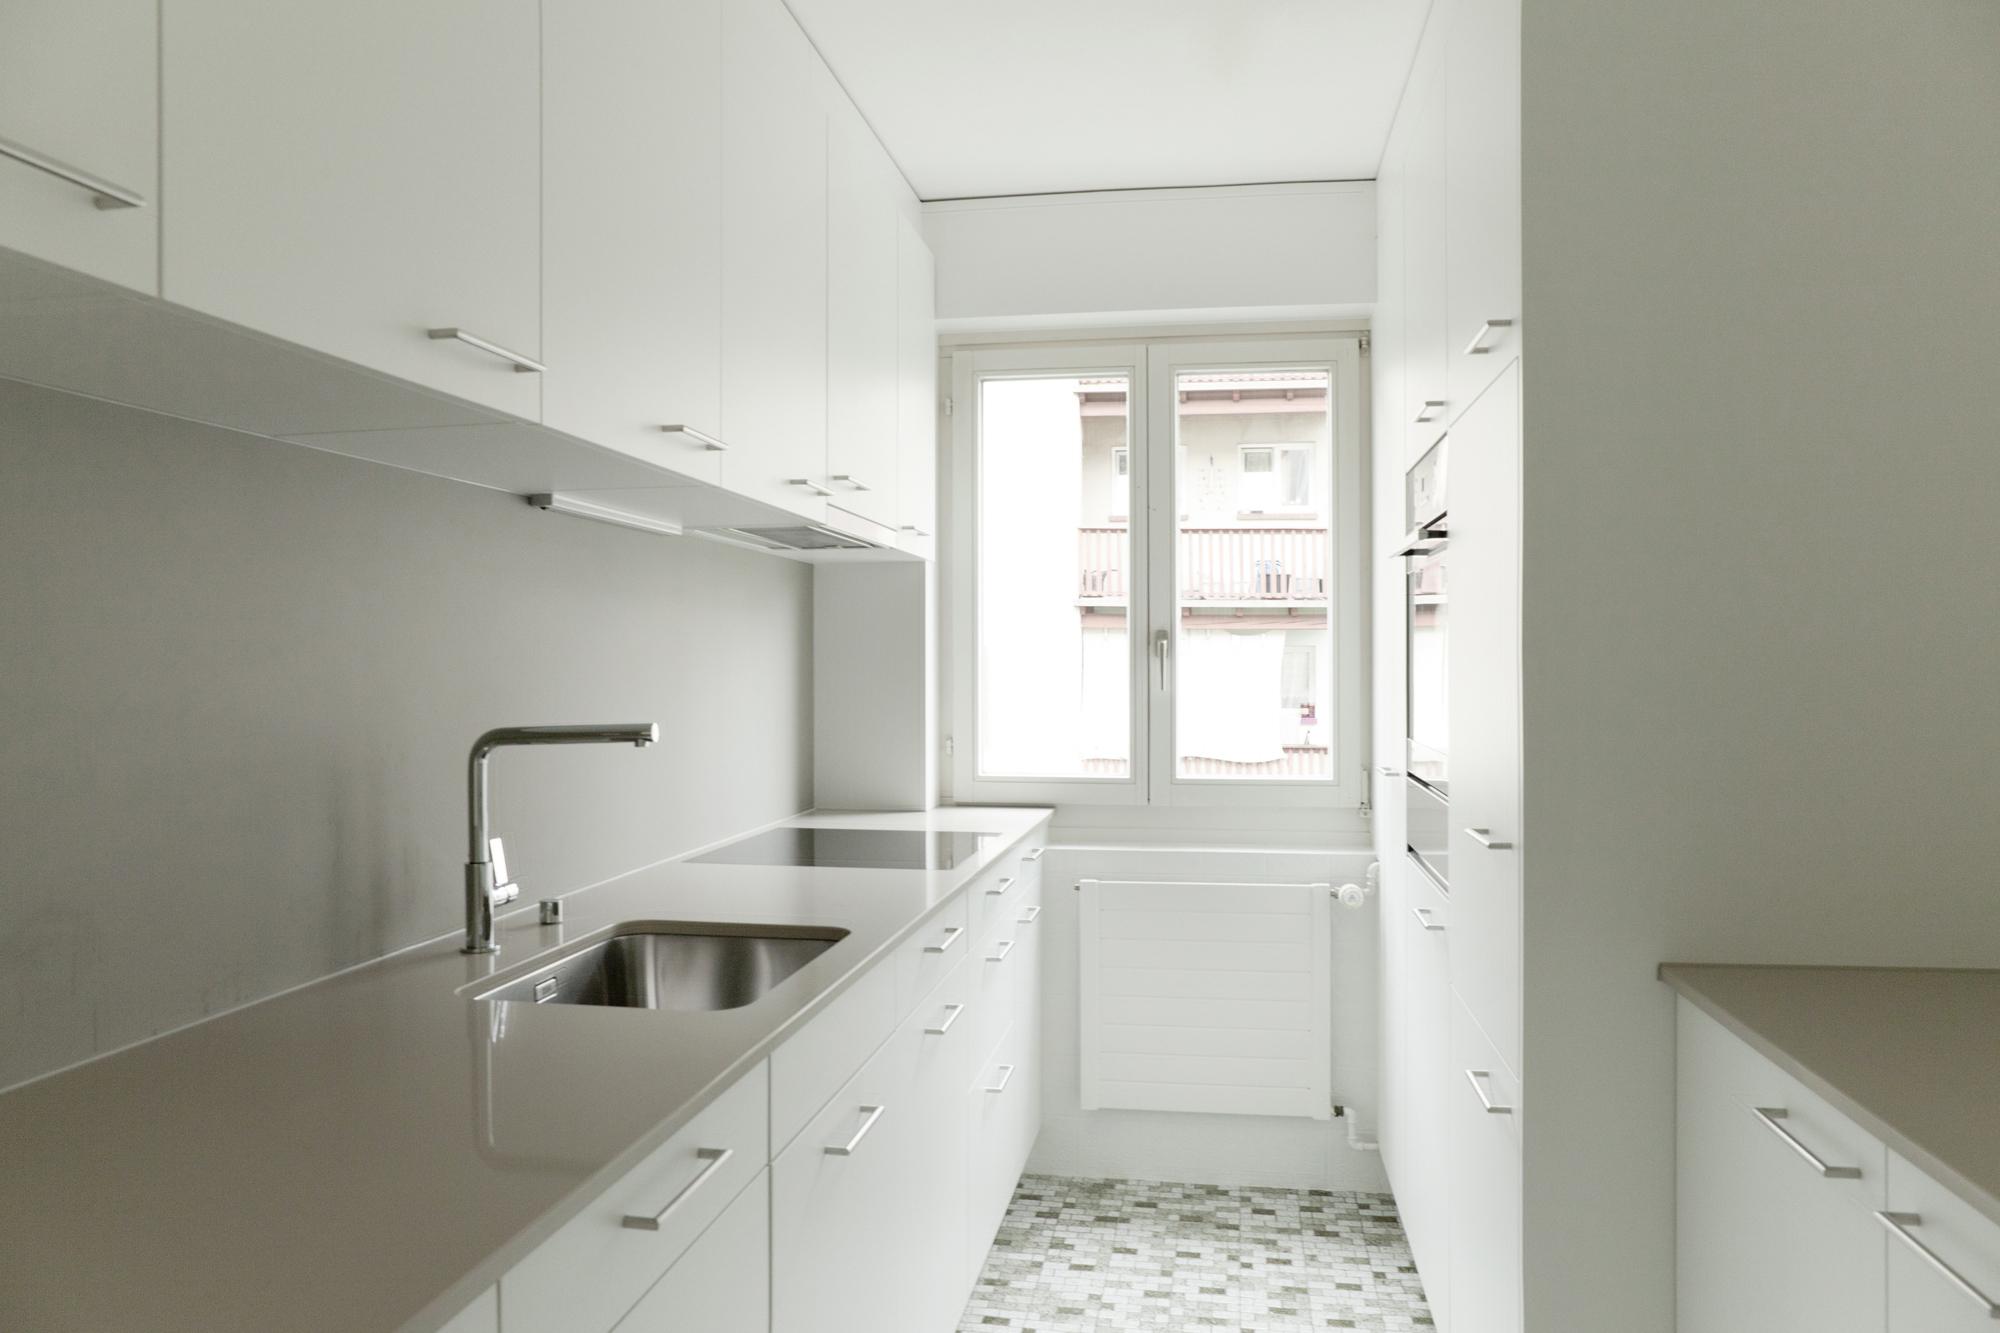 005_04_Küche.jpg